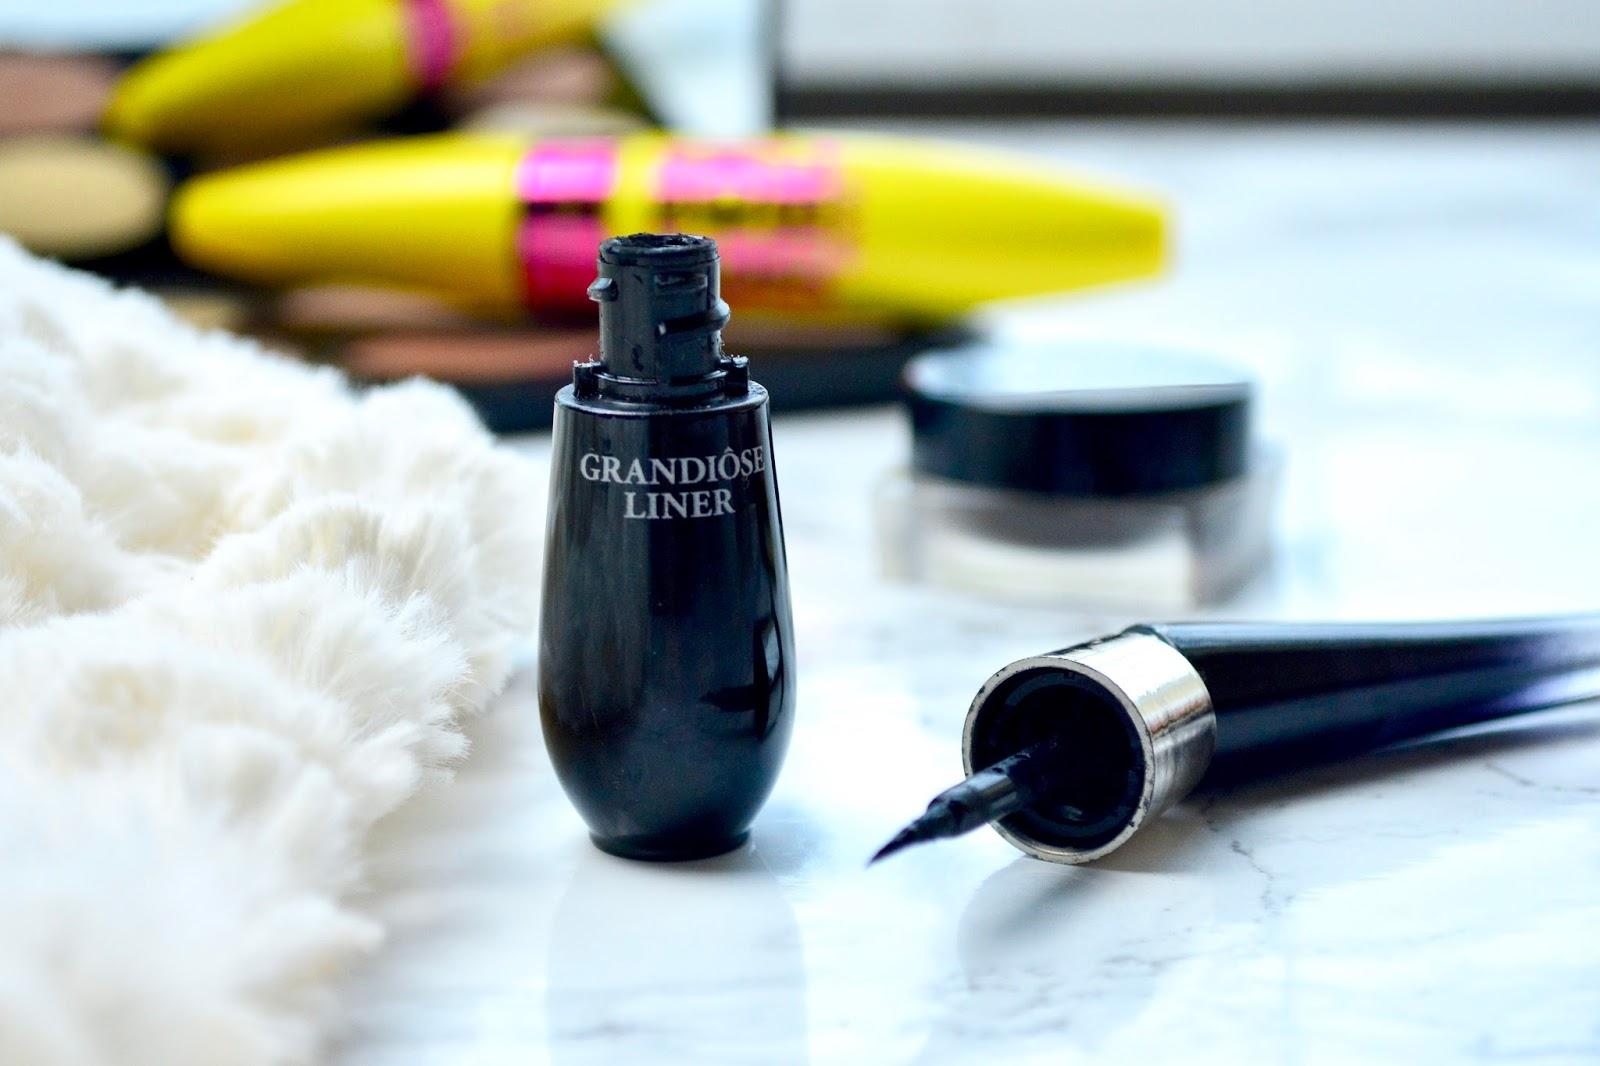 Lancome Grandiose Eyeliner